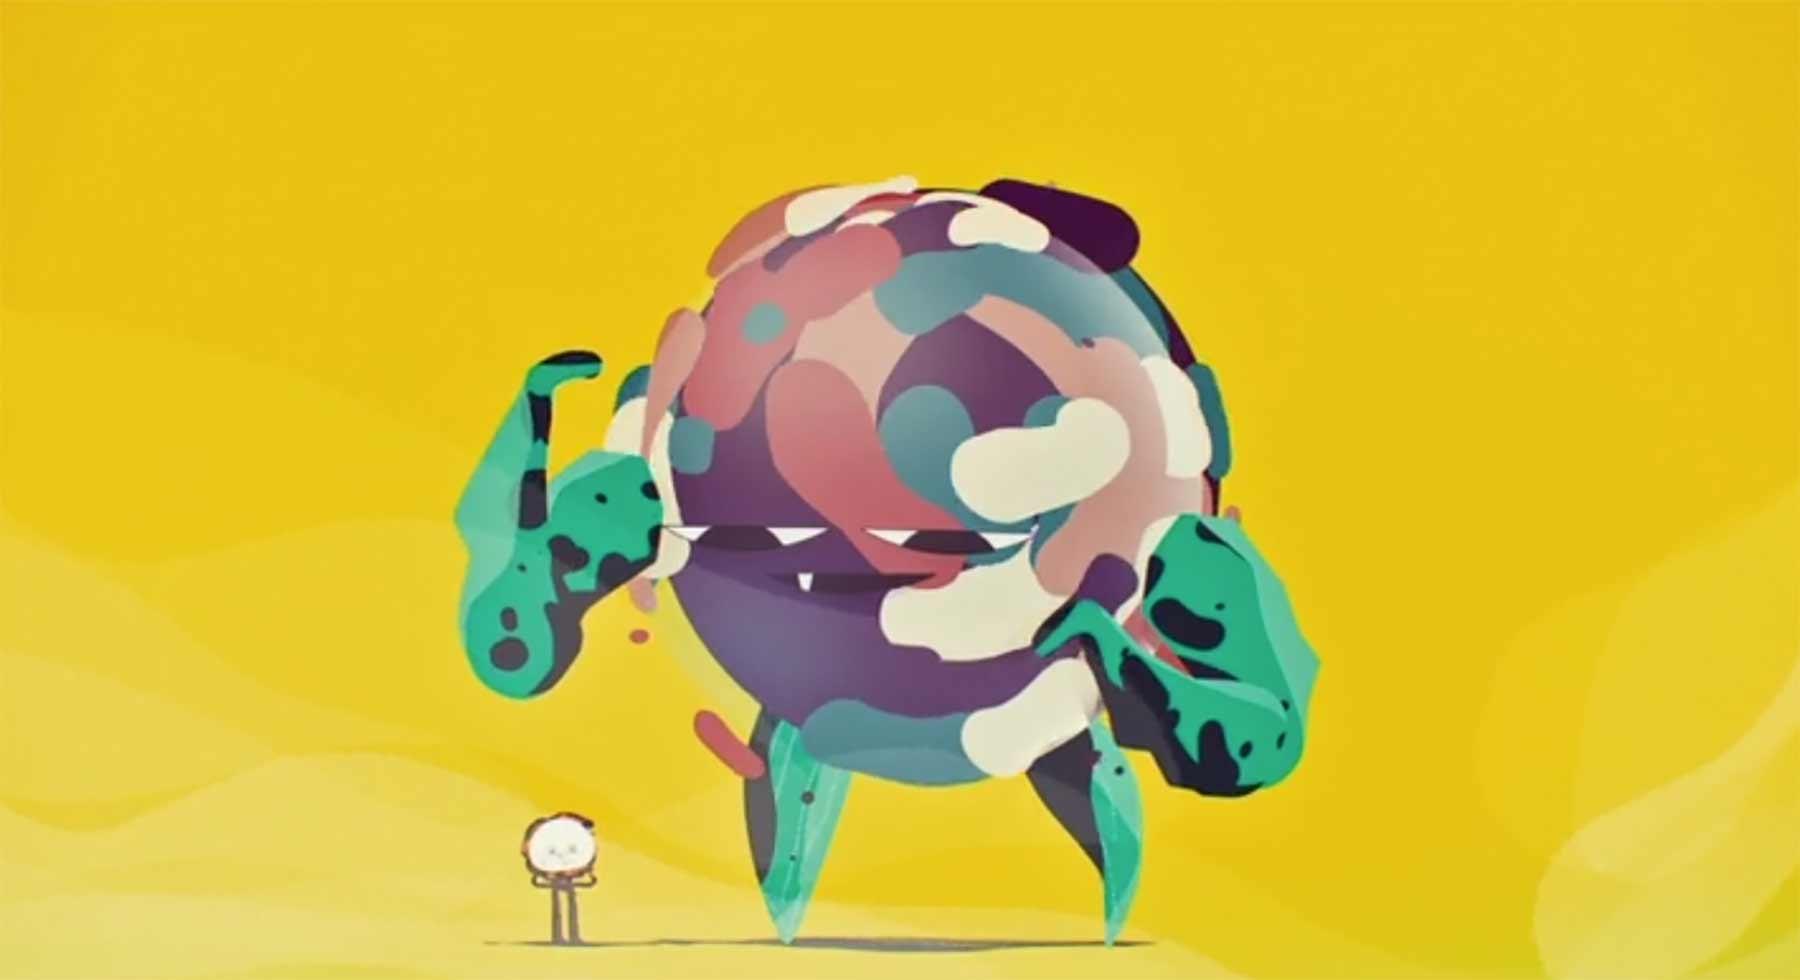 Super-Baketerien bedrohen die Menschheit superbacterias